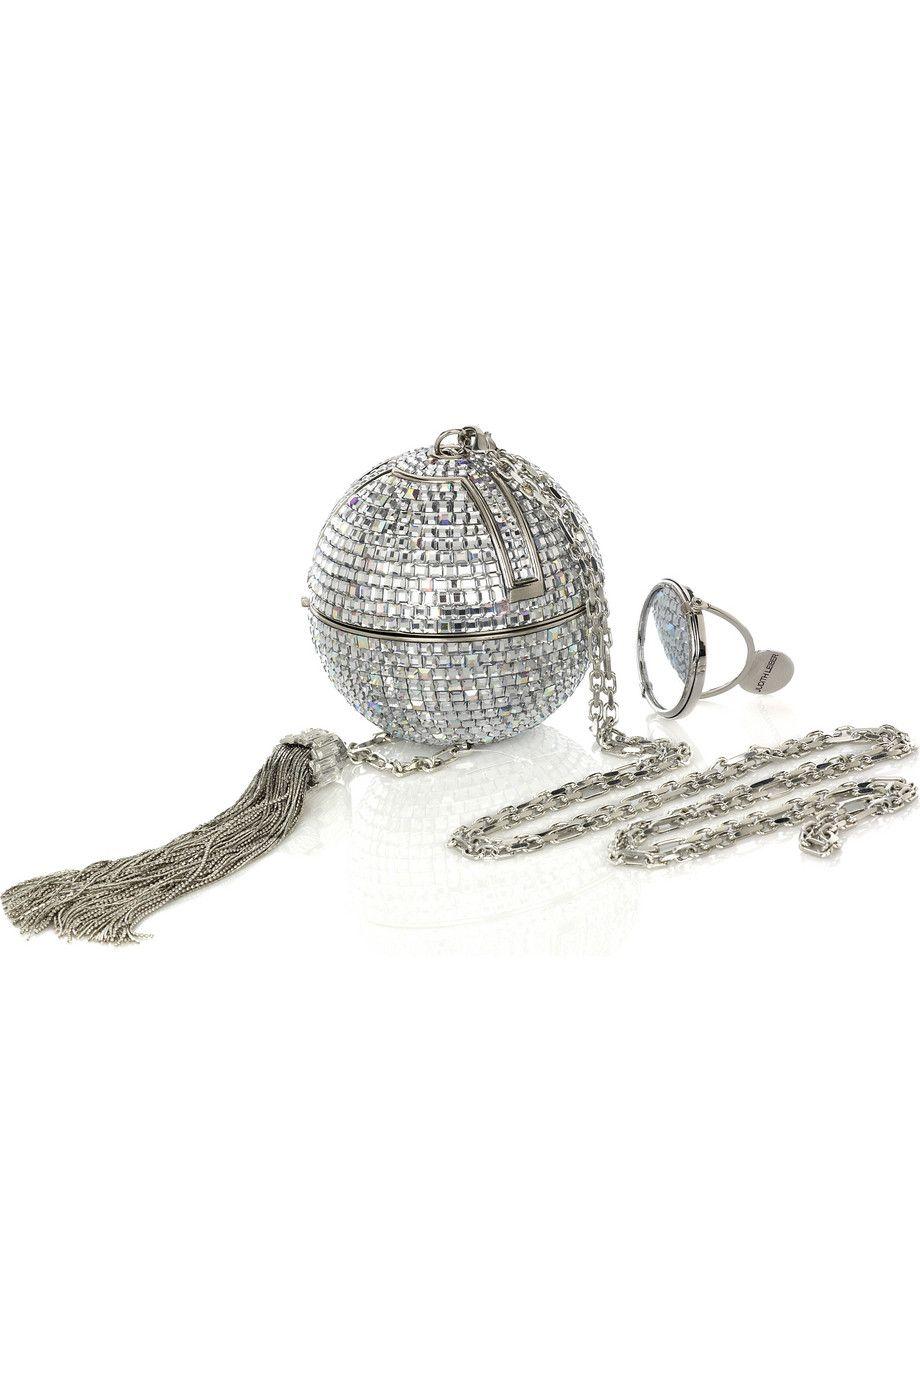 Judith Leiber Sphere clutch